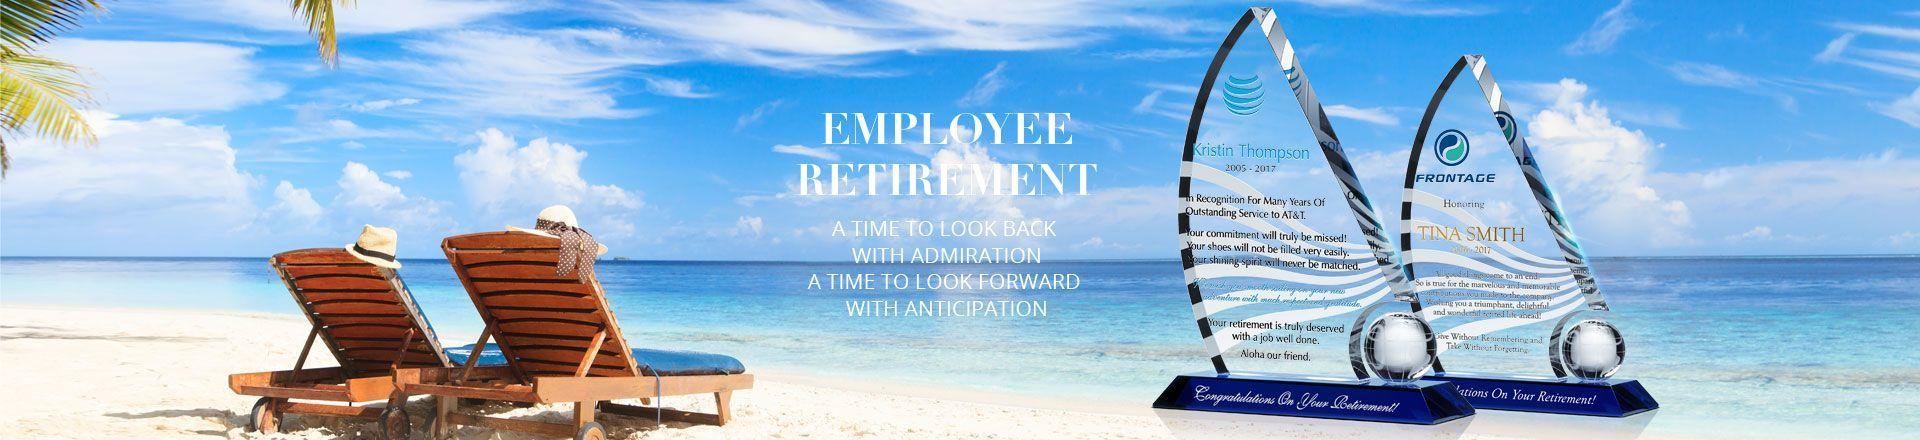 Unique Retirement Plaques with Sample Award Wording Ideas ...